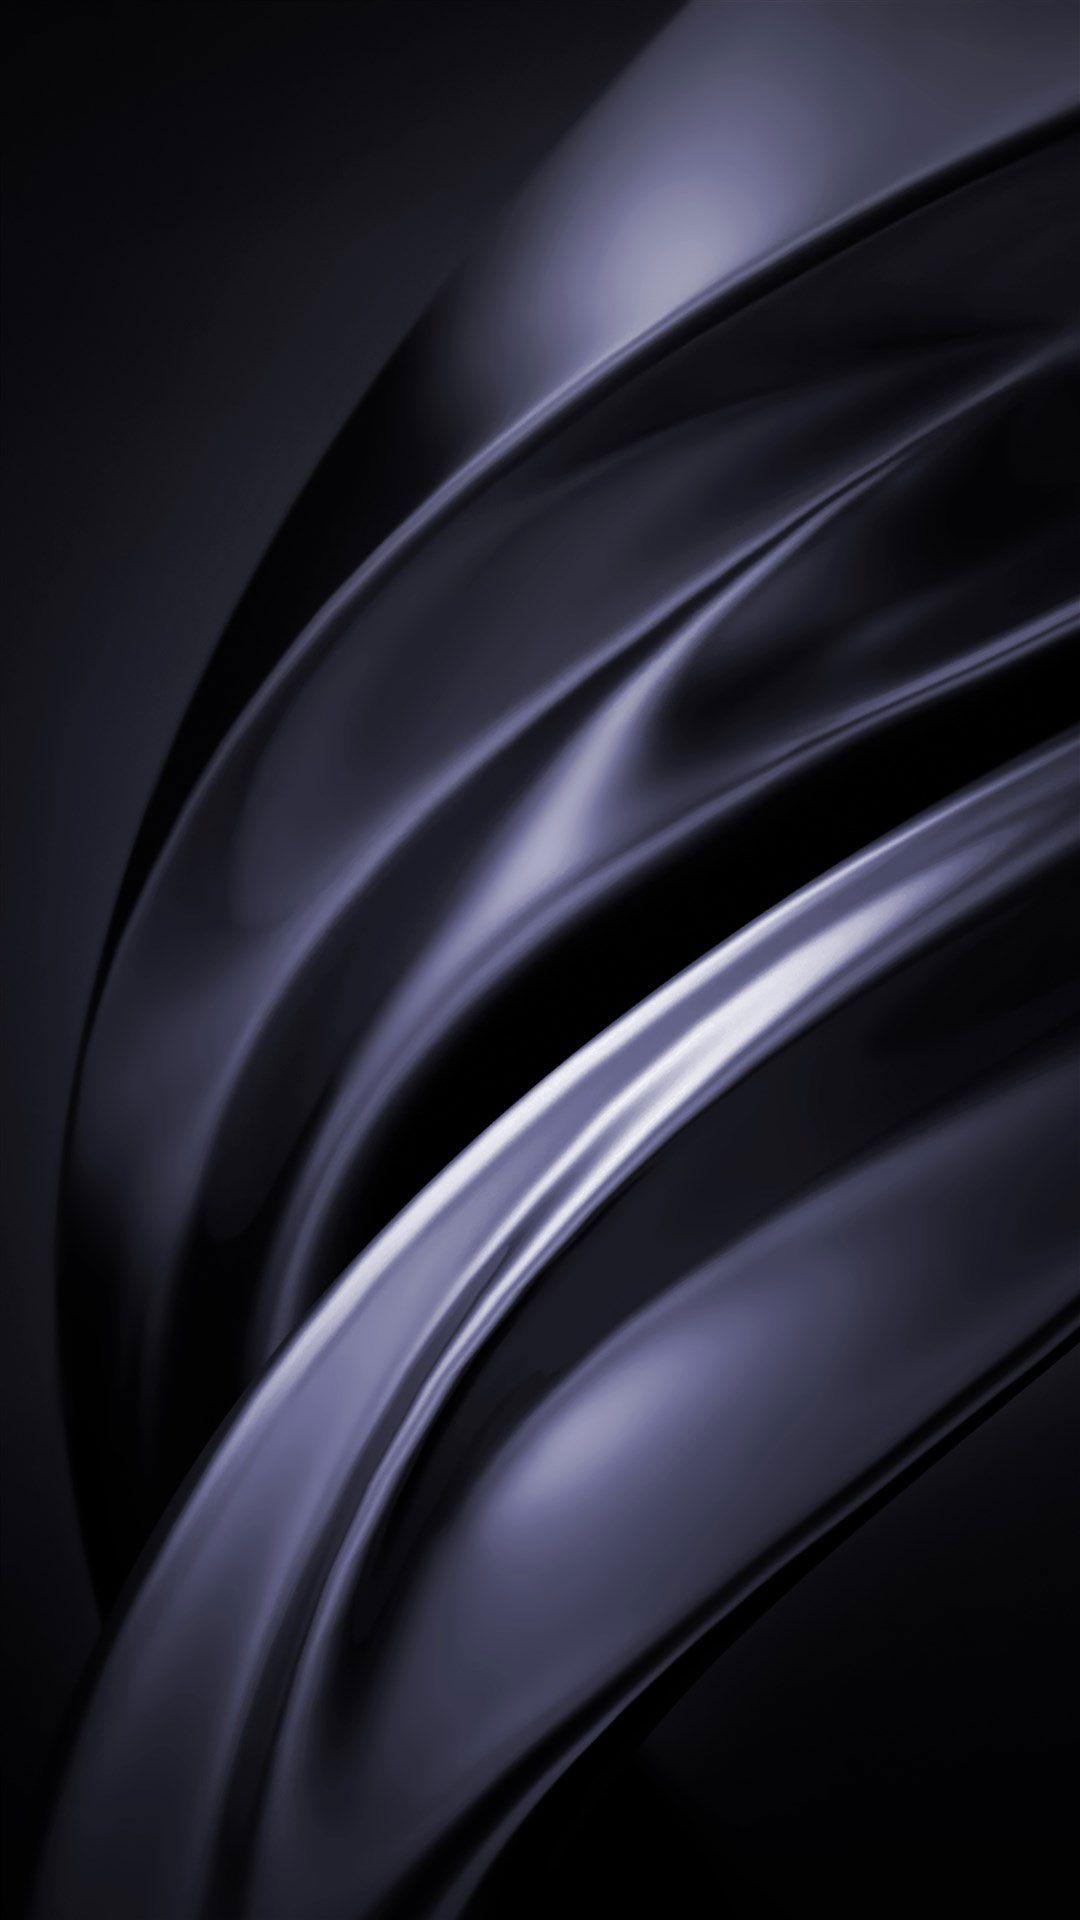 Miui8 Xiaomi6 Wallpaper 005 Jpg 1080 19 スマホ 壁紙 黒 黒の壁紙 黒壁紙